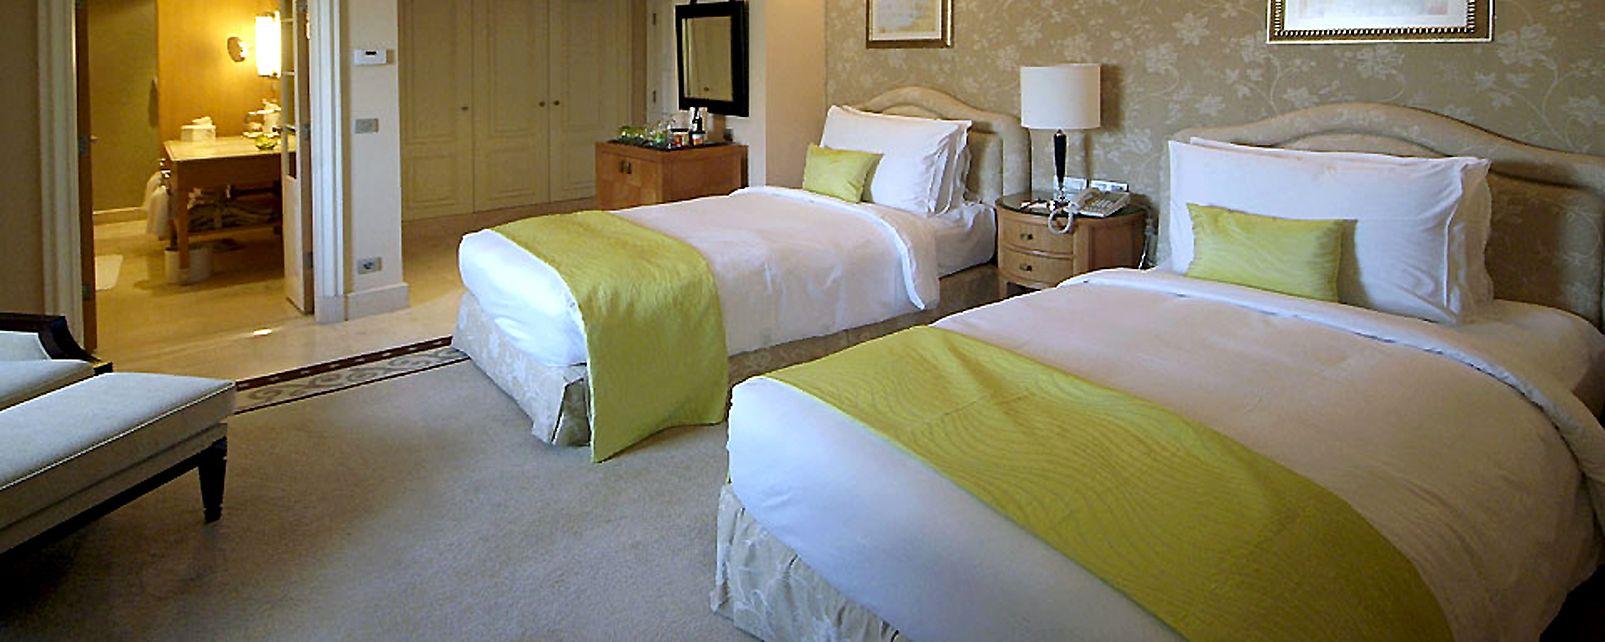 Hotel Kempinski Nile Hotel